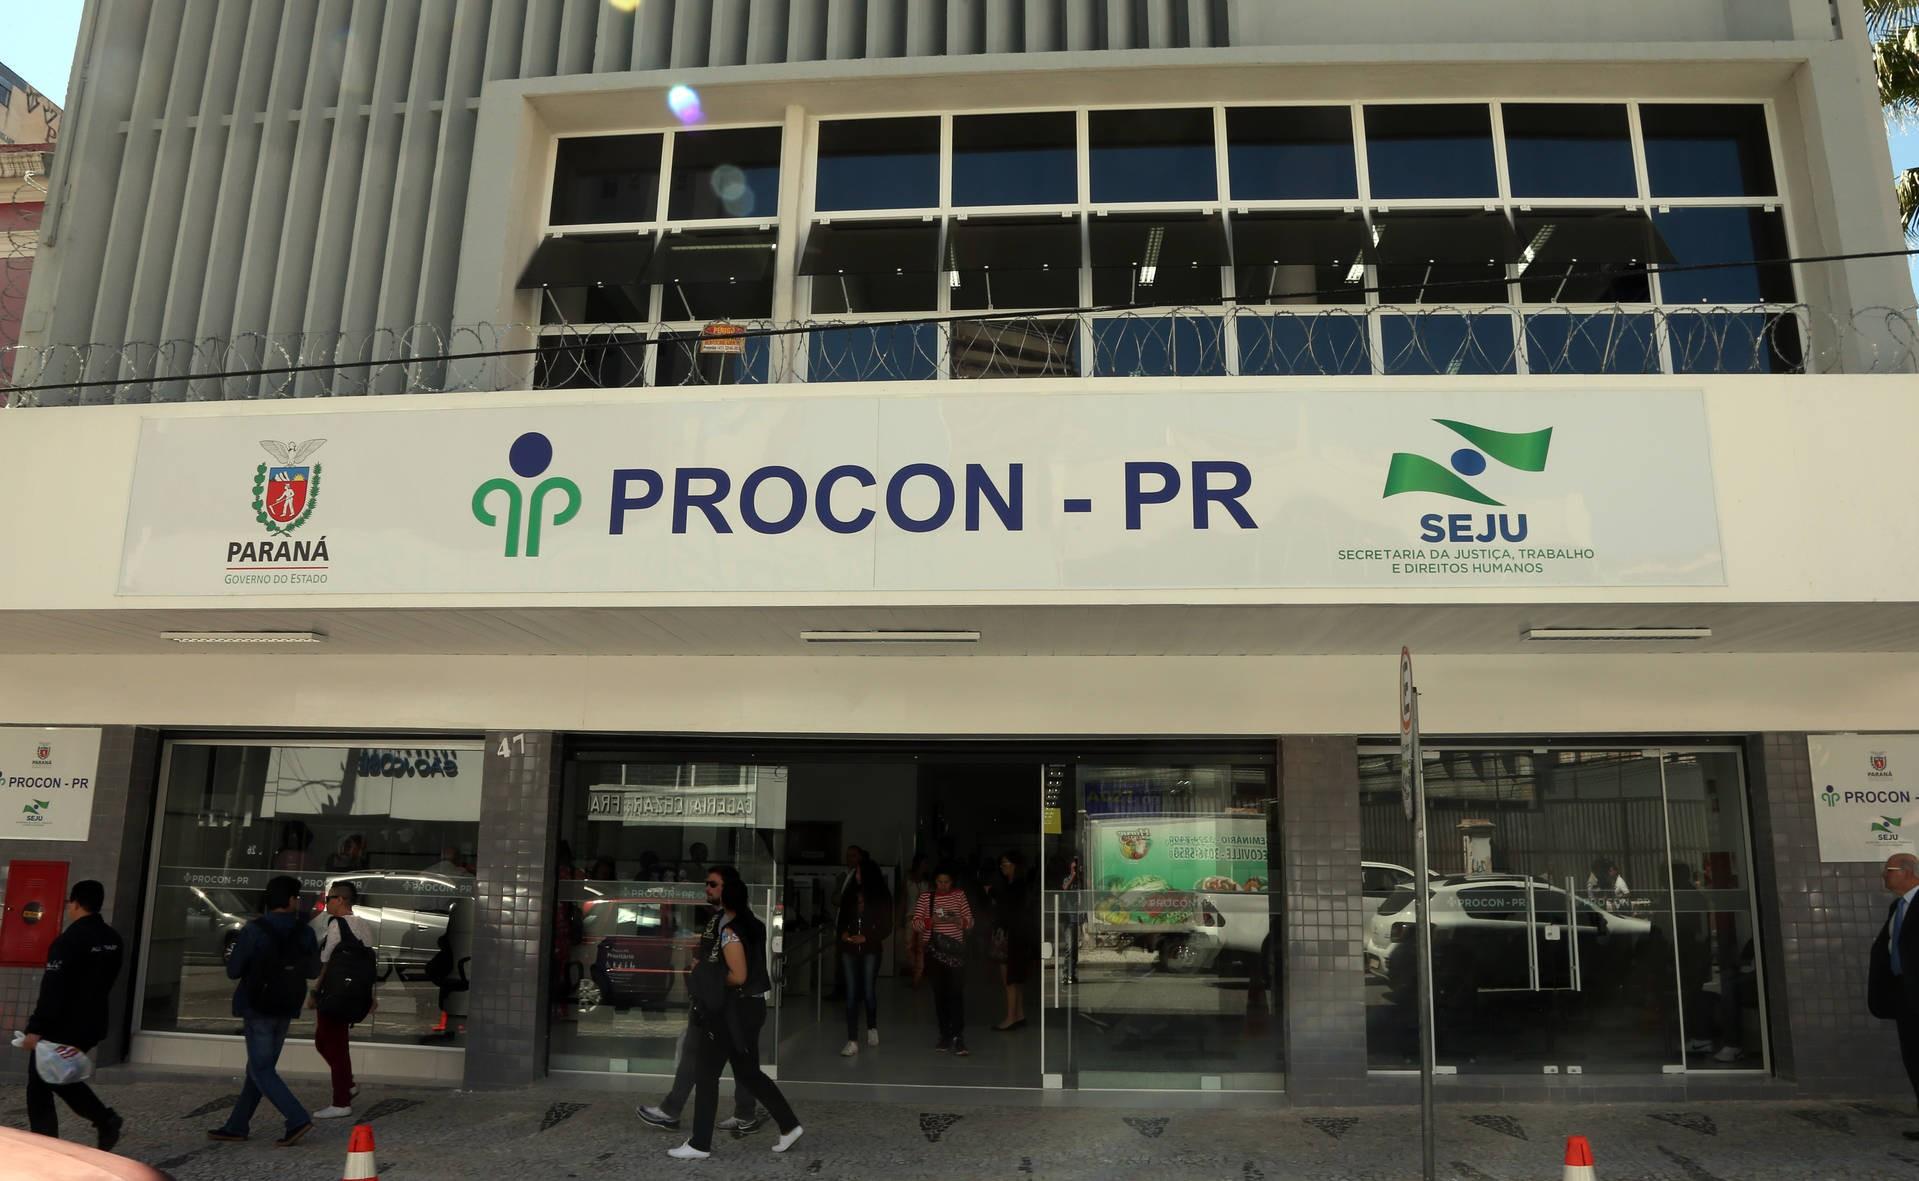 Procon suspende atendimento presencial no Paraná entre segunda (25) e sexta (29); veja como usar serviço